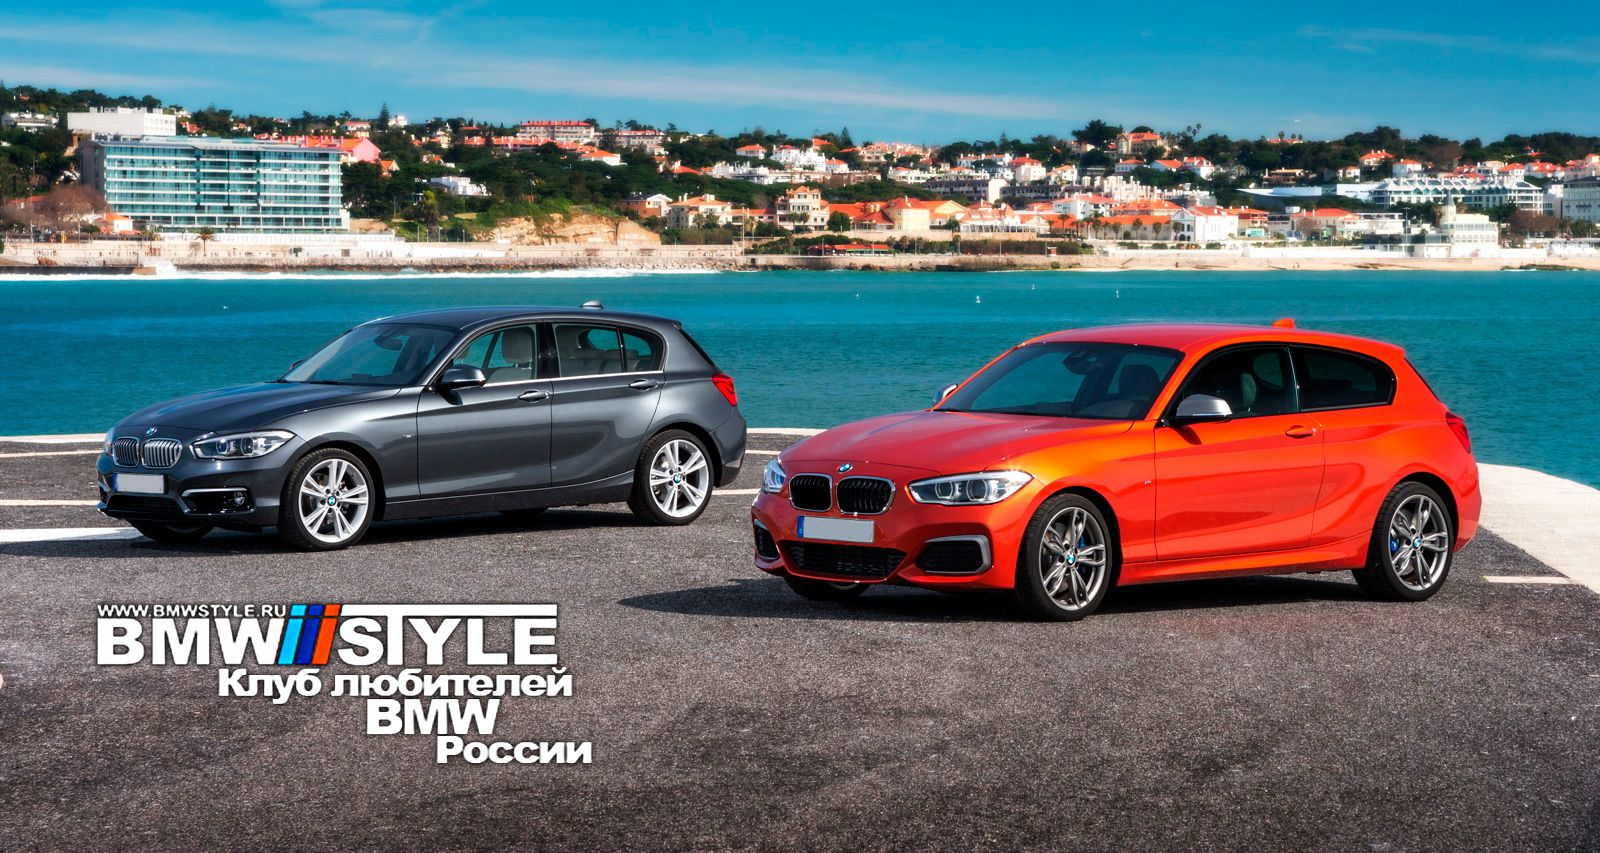 BMW 1-й серии f20 f21 бмв 1 клуб, форум, bmw 1 forum club